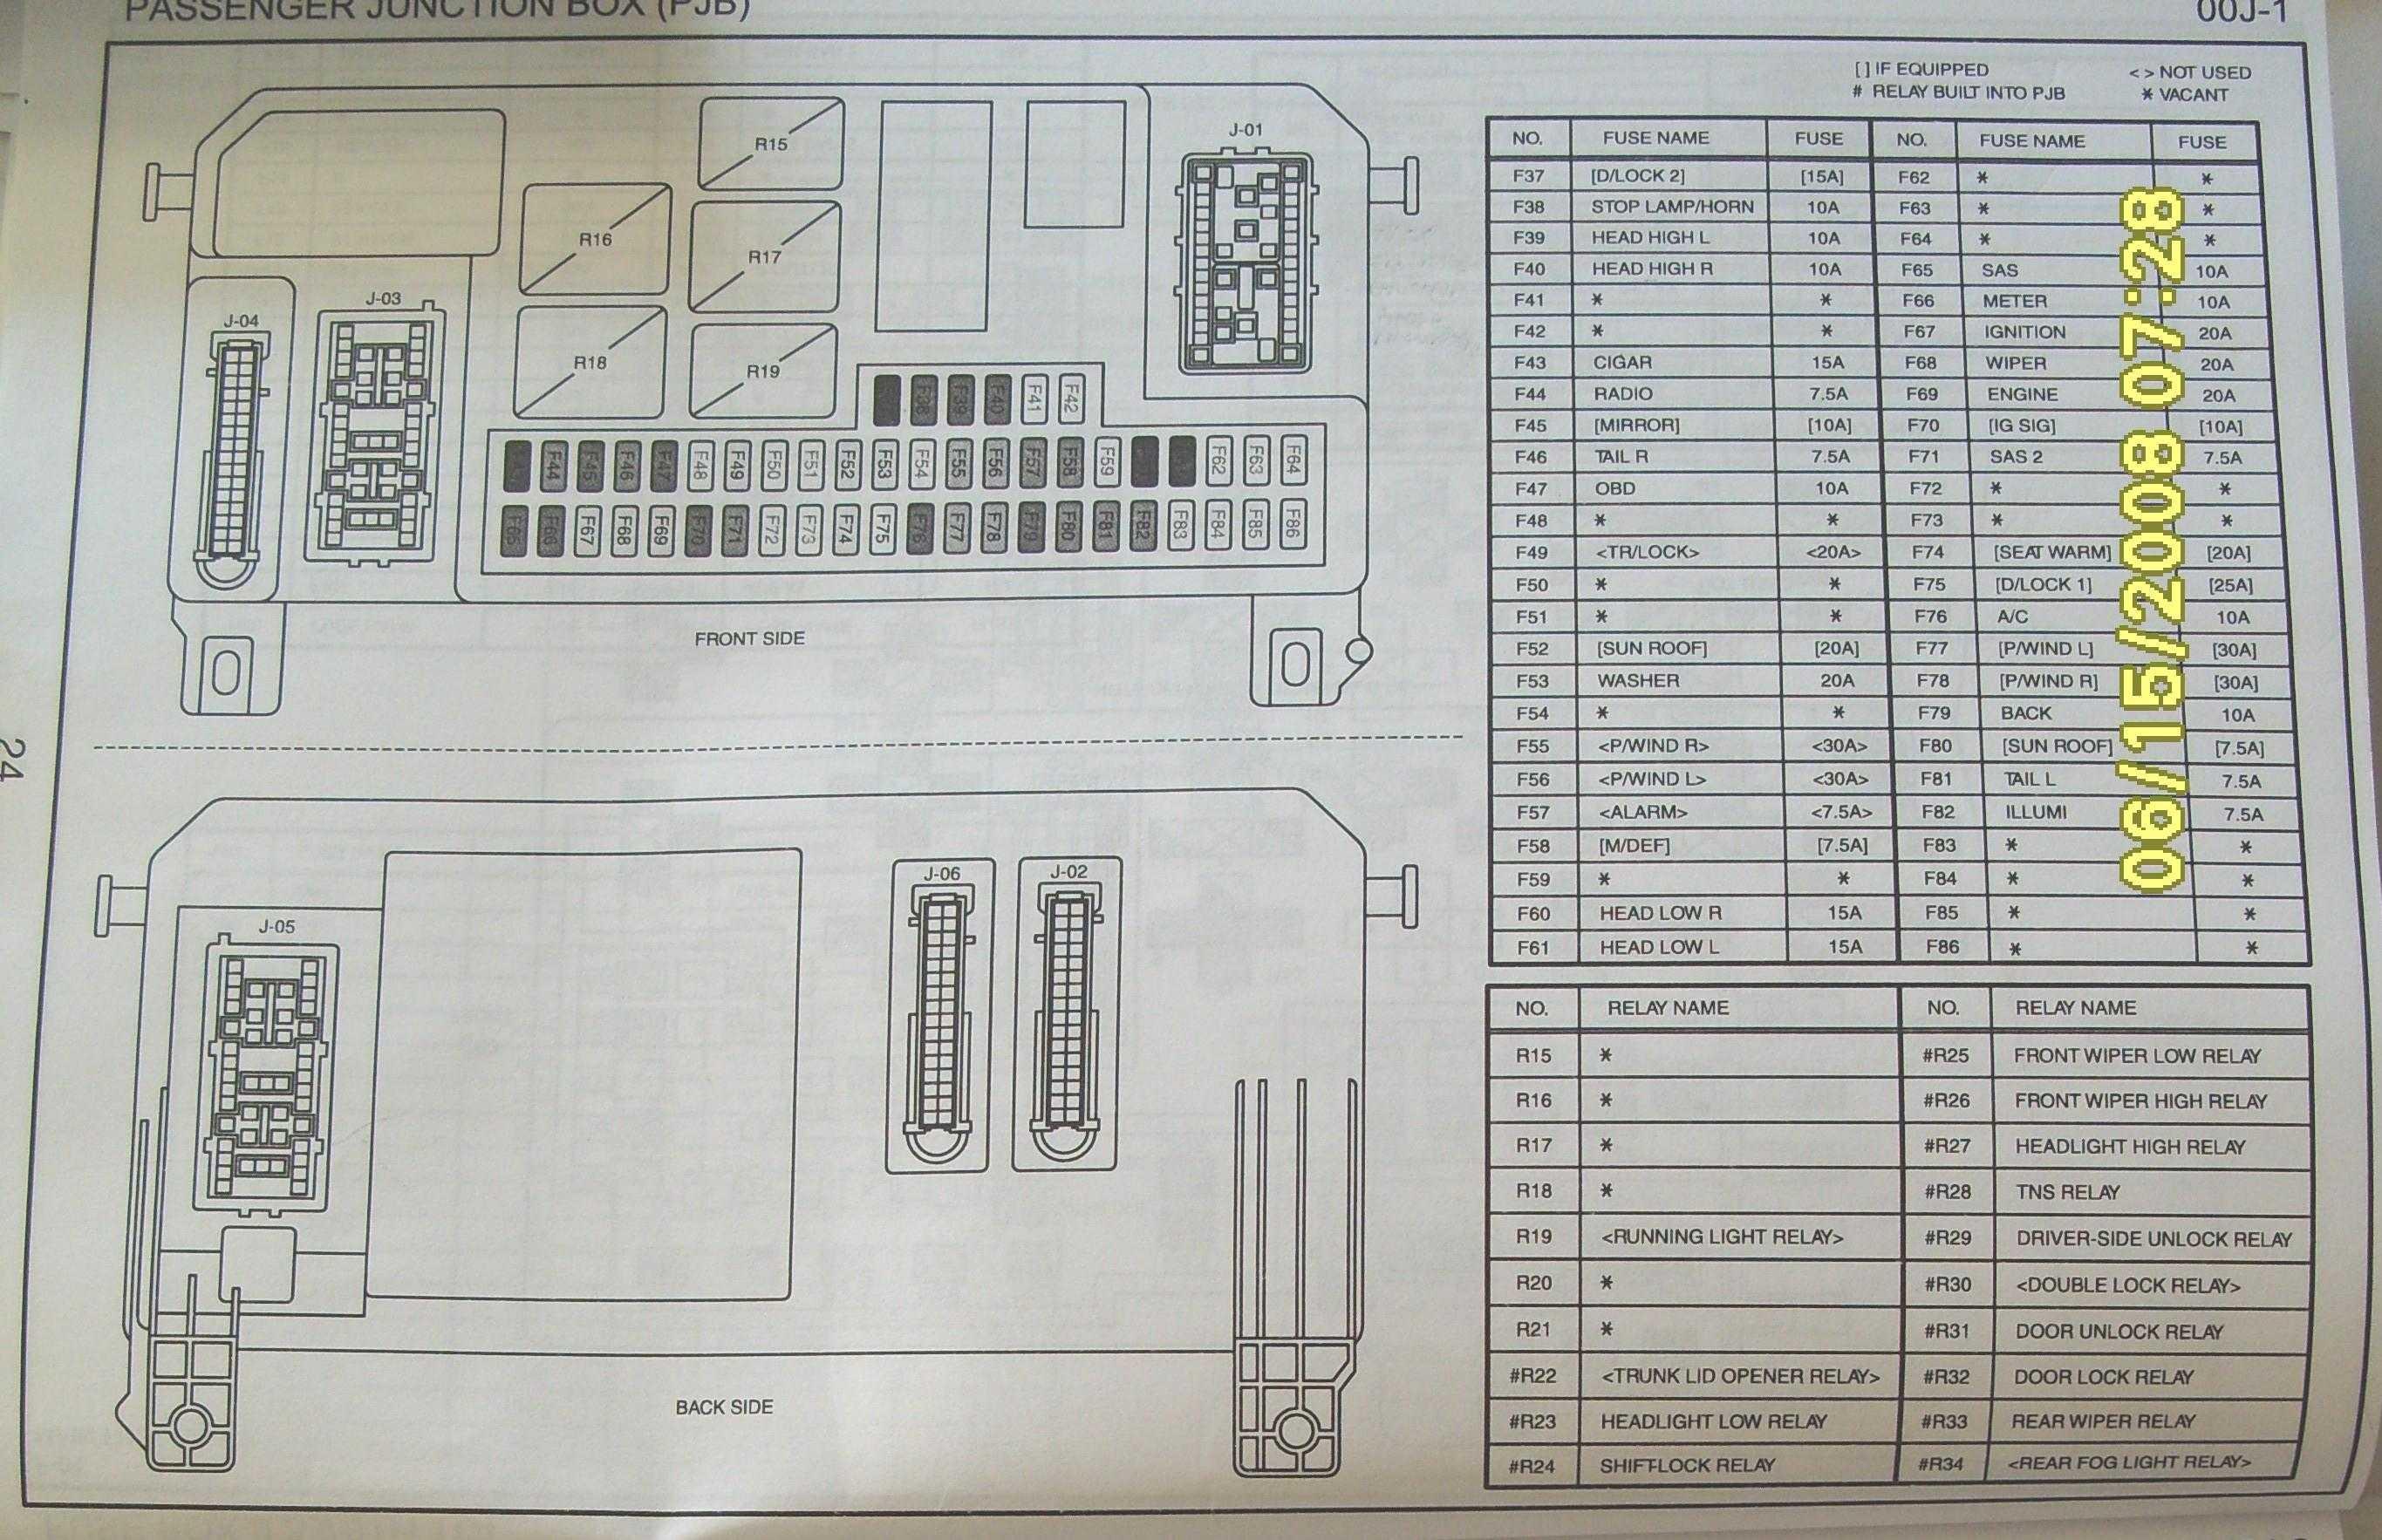 Mazda 3 2006 Fuse Diagram Detailed Schematics 2004 Wiring Diagrams Box Auto Electrical Chevy Trailblazer